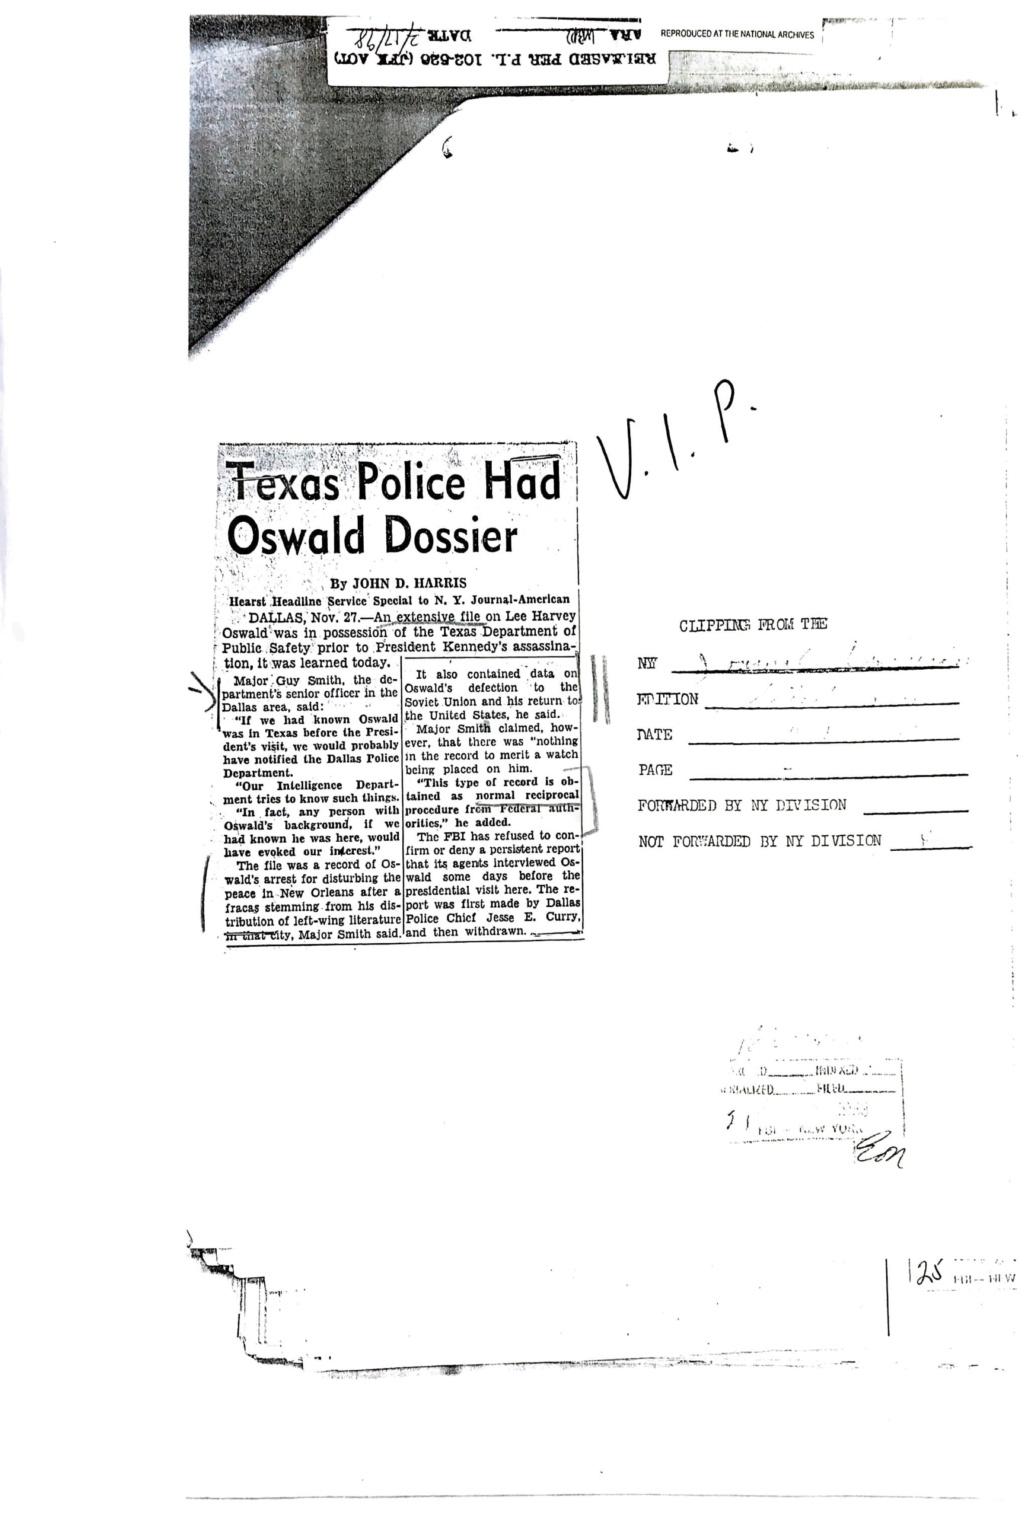 Texas Police Had Oswald Dossier F1413810